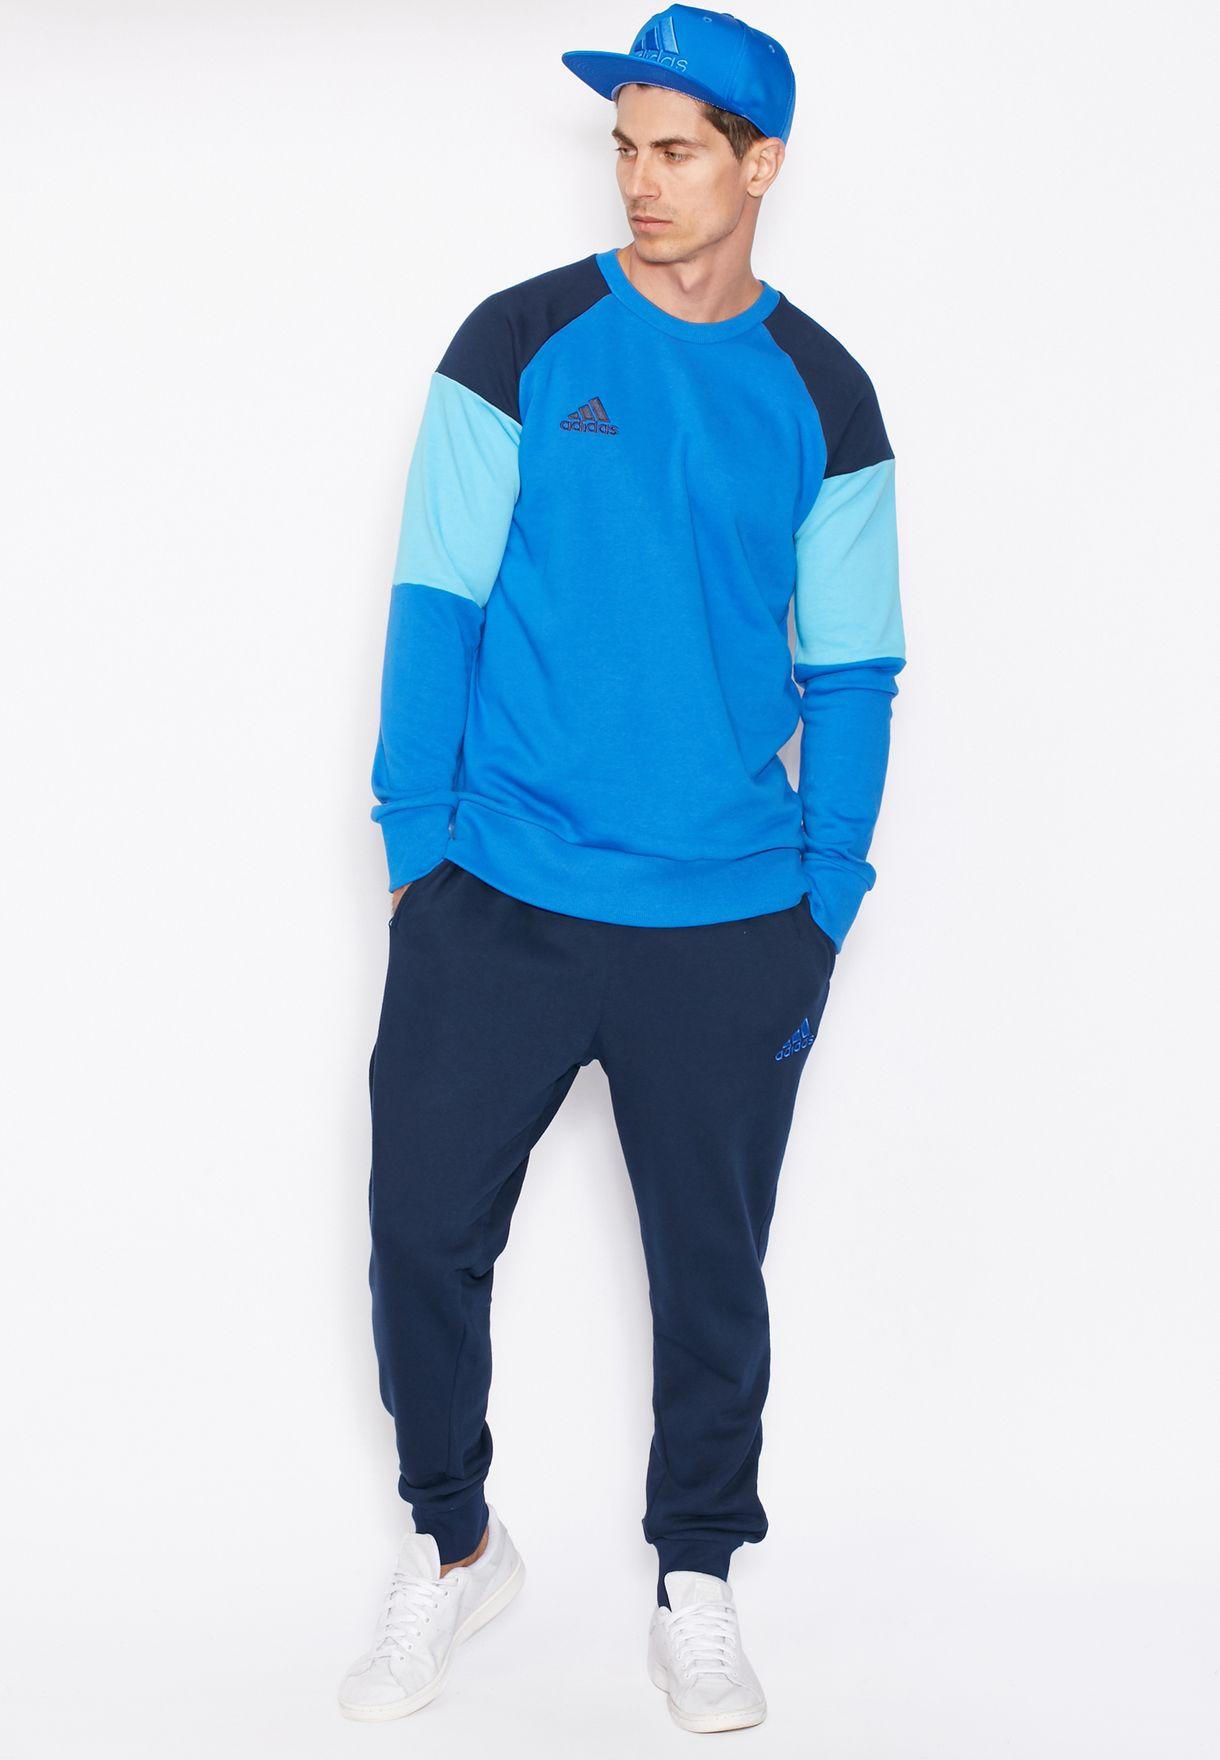 Buy Adidas Blue Condivo 16 Sweatshirt For Men In Mena Worldwide Ac4300 [ 1760 x 1220 Pixel ]